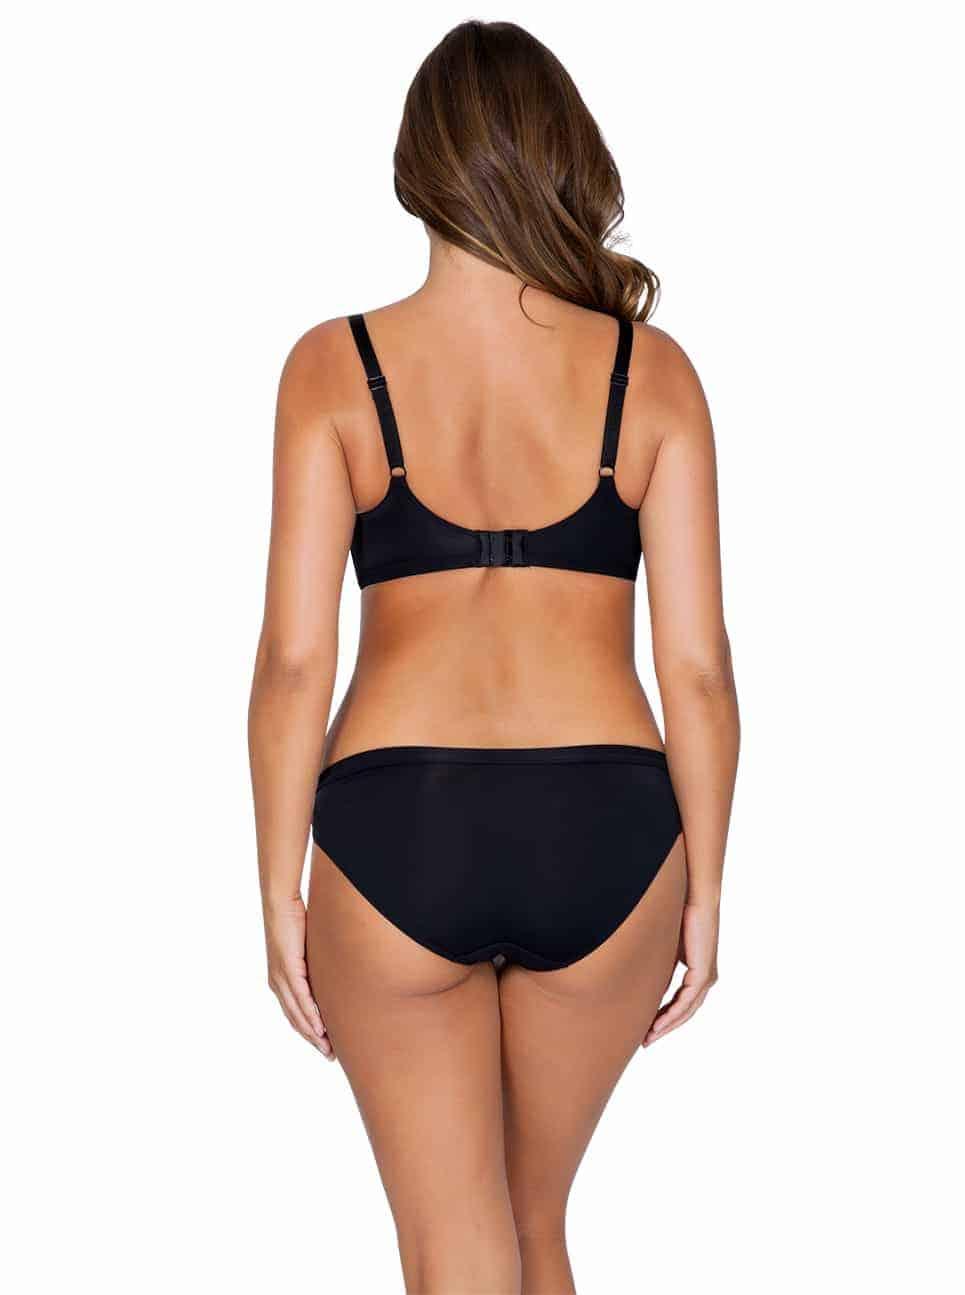 WendyP5411 PlungePadded P5413 BikiniBlackBack - Wendy Plunge Padded Bra - Black – P5411